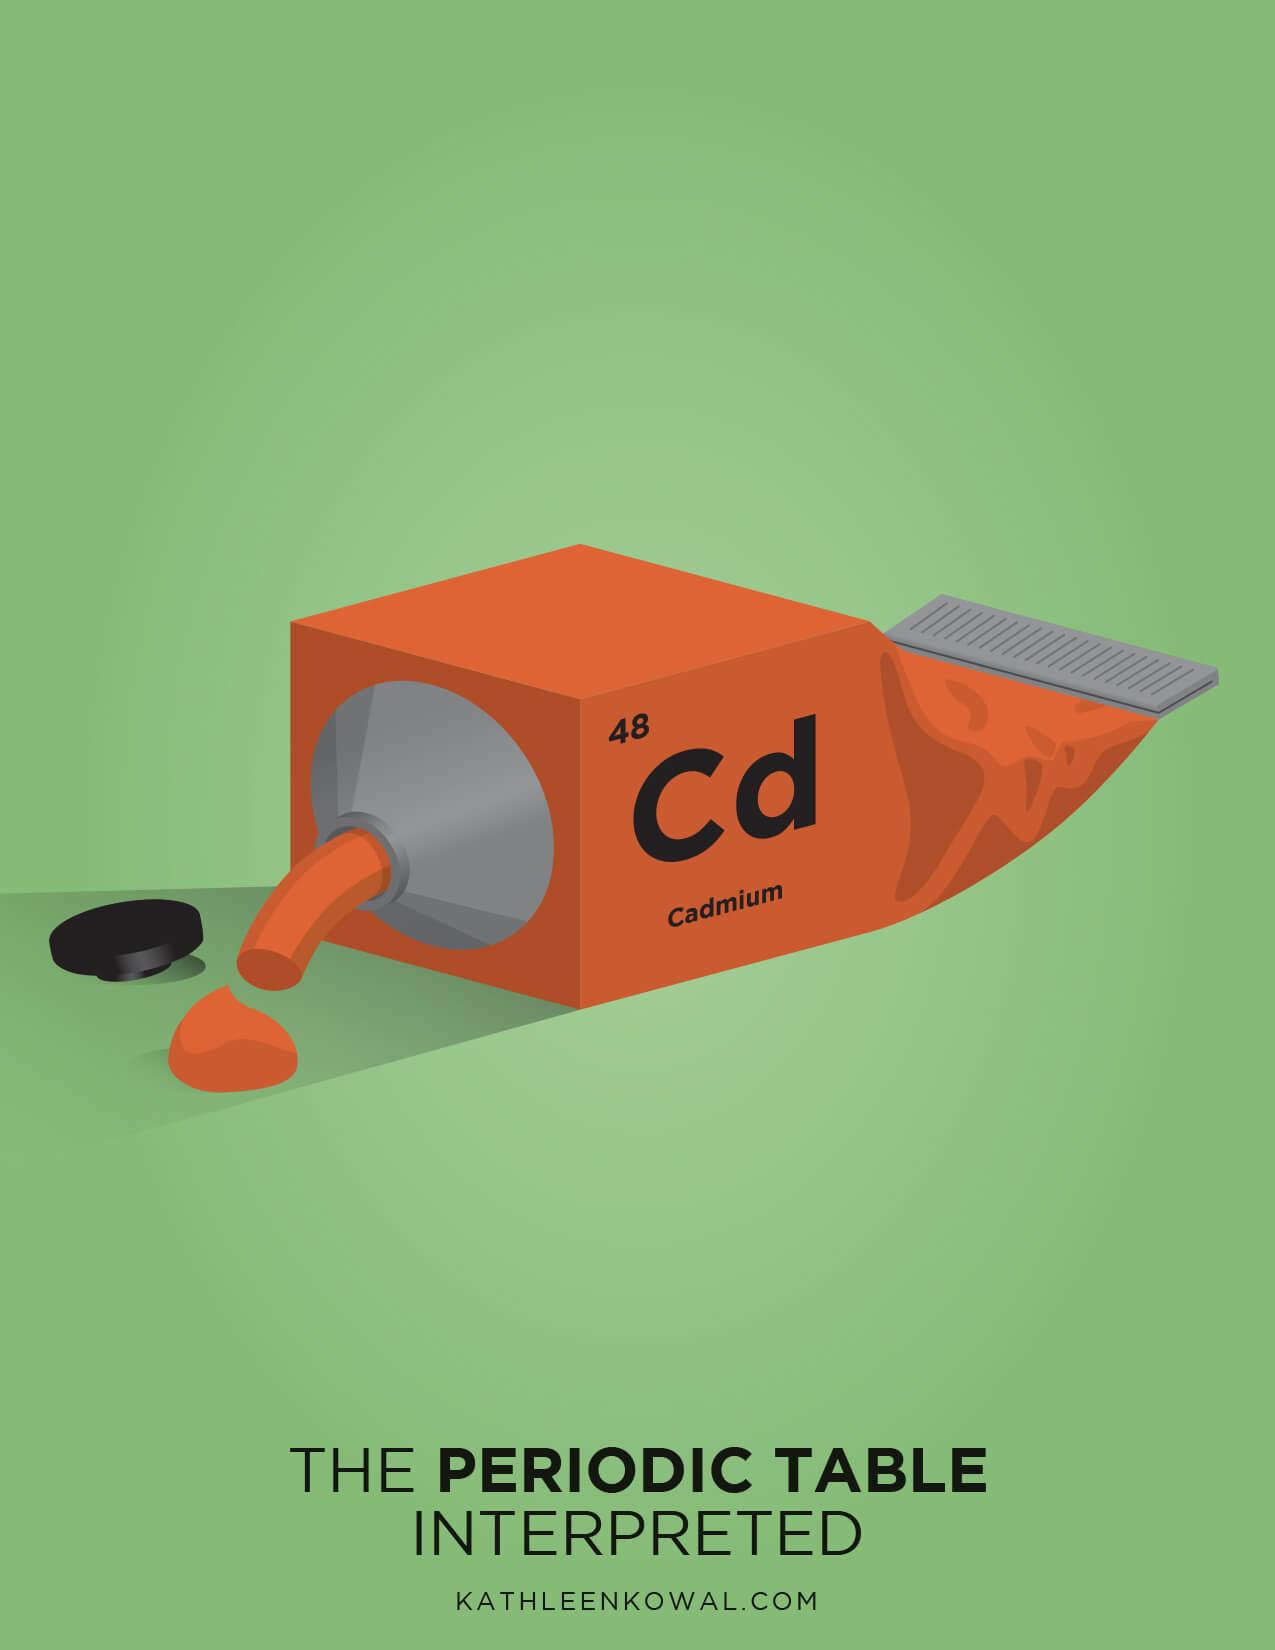 Periodic Table Interpreted Series - Kathleen Kowal